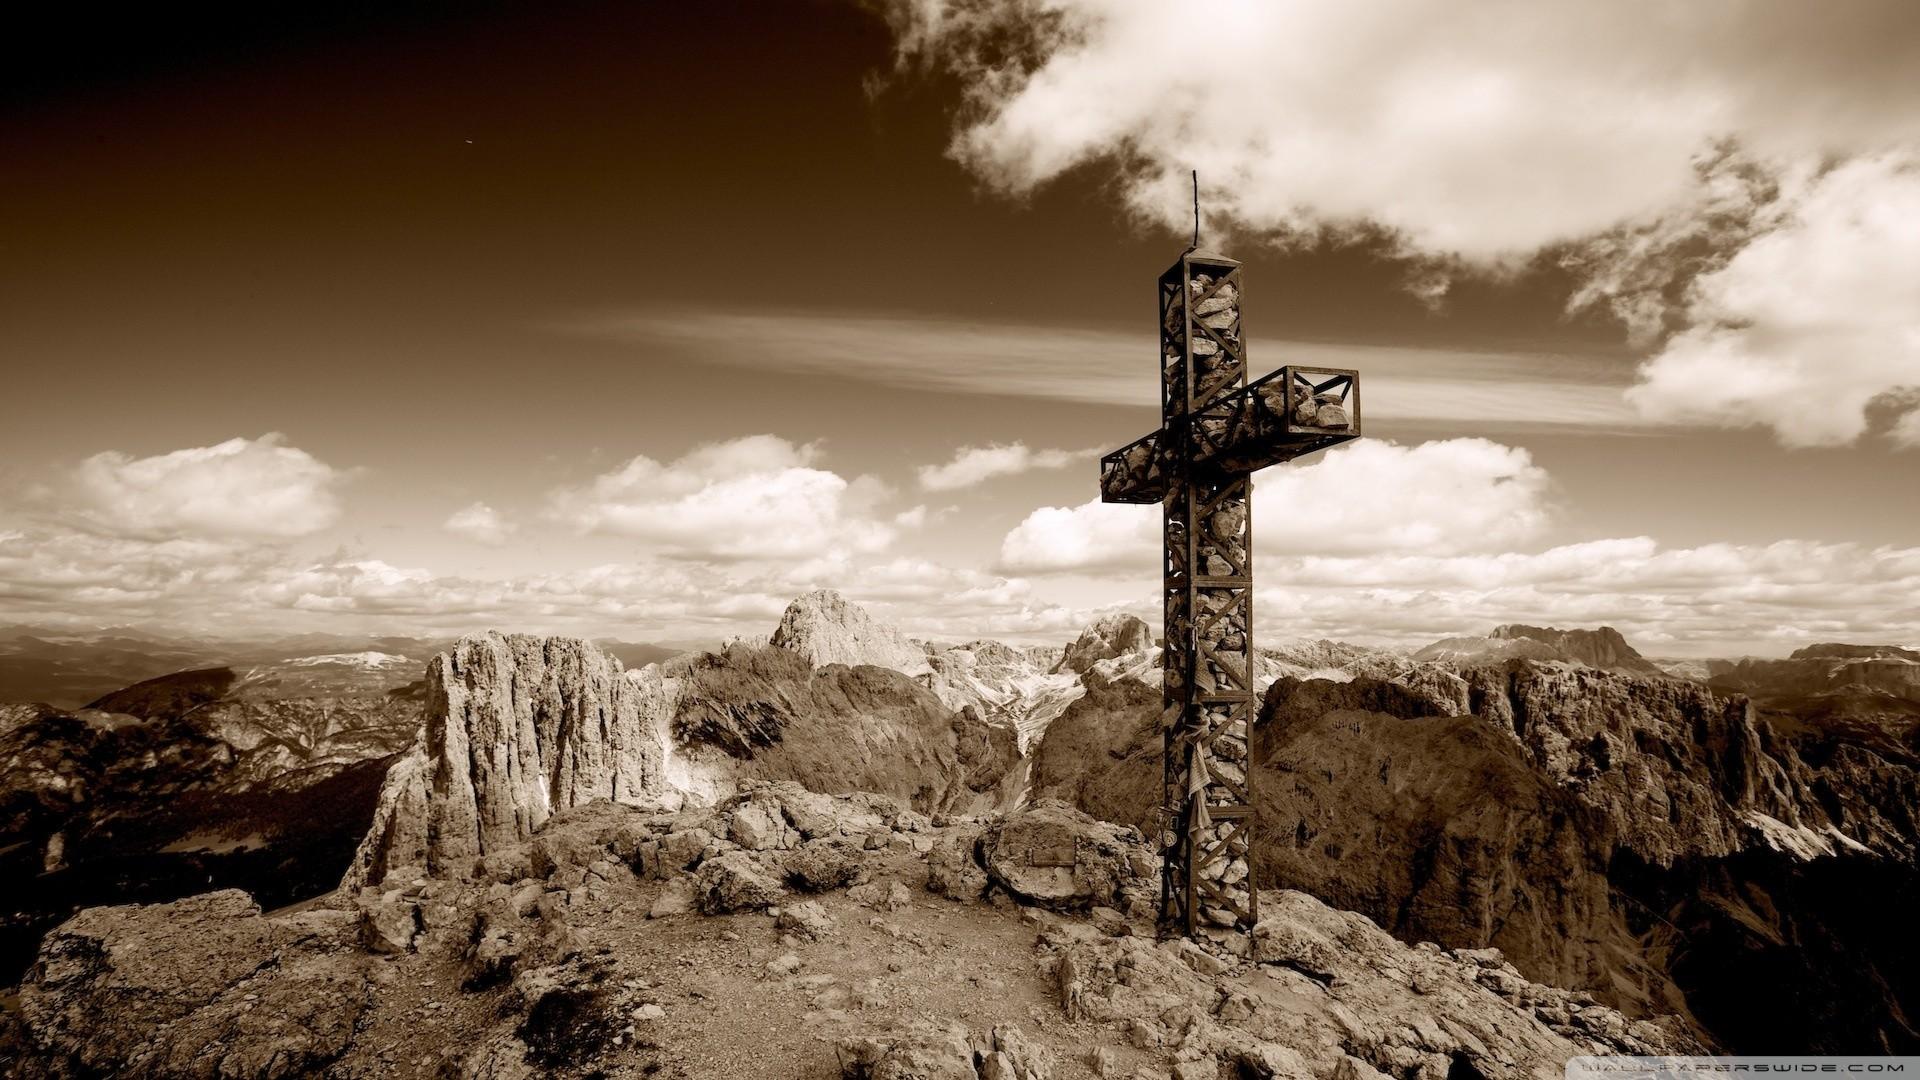 Jesus Christ On The Cross Wallpapers Wallpaper Images Of The Cross Wallpapers  Wallpapers)